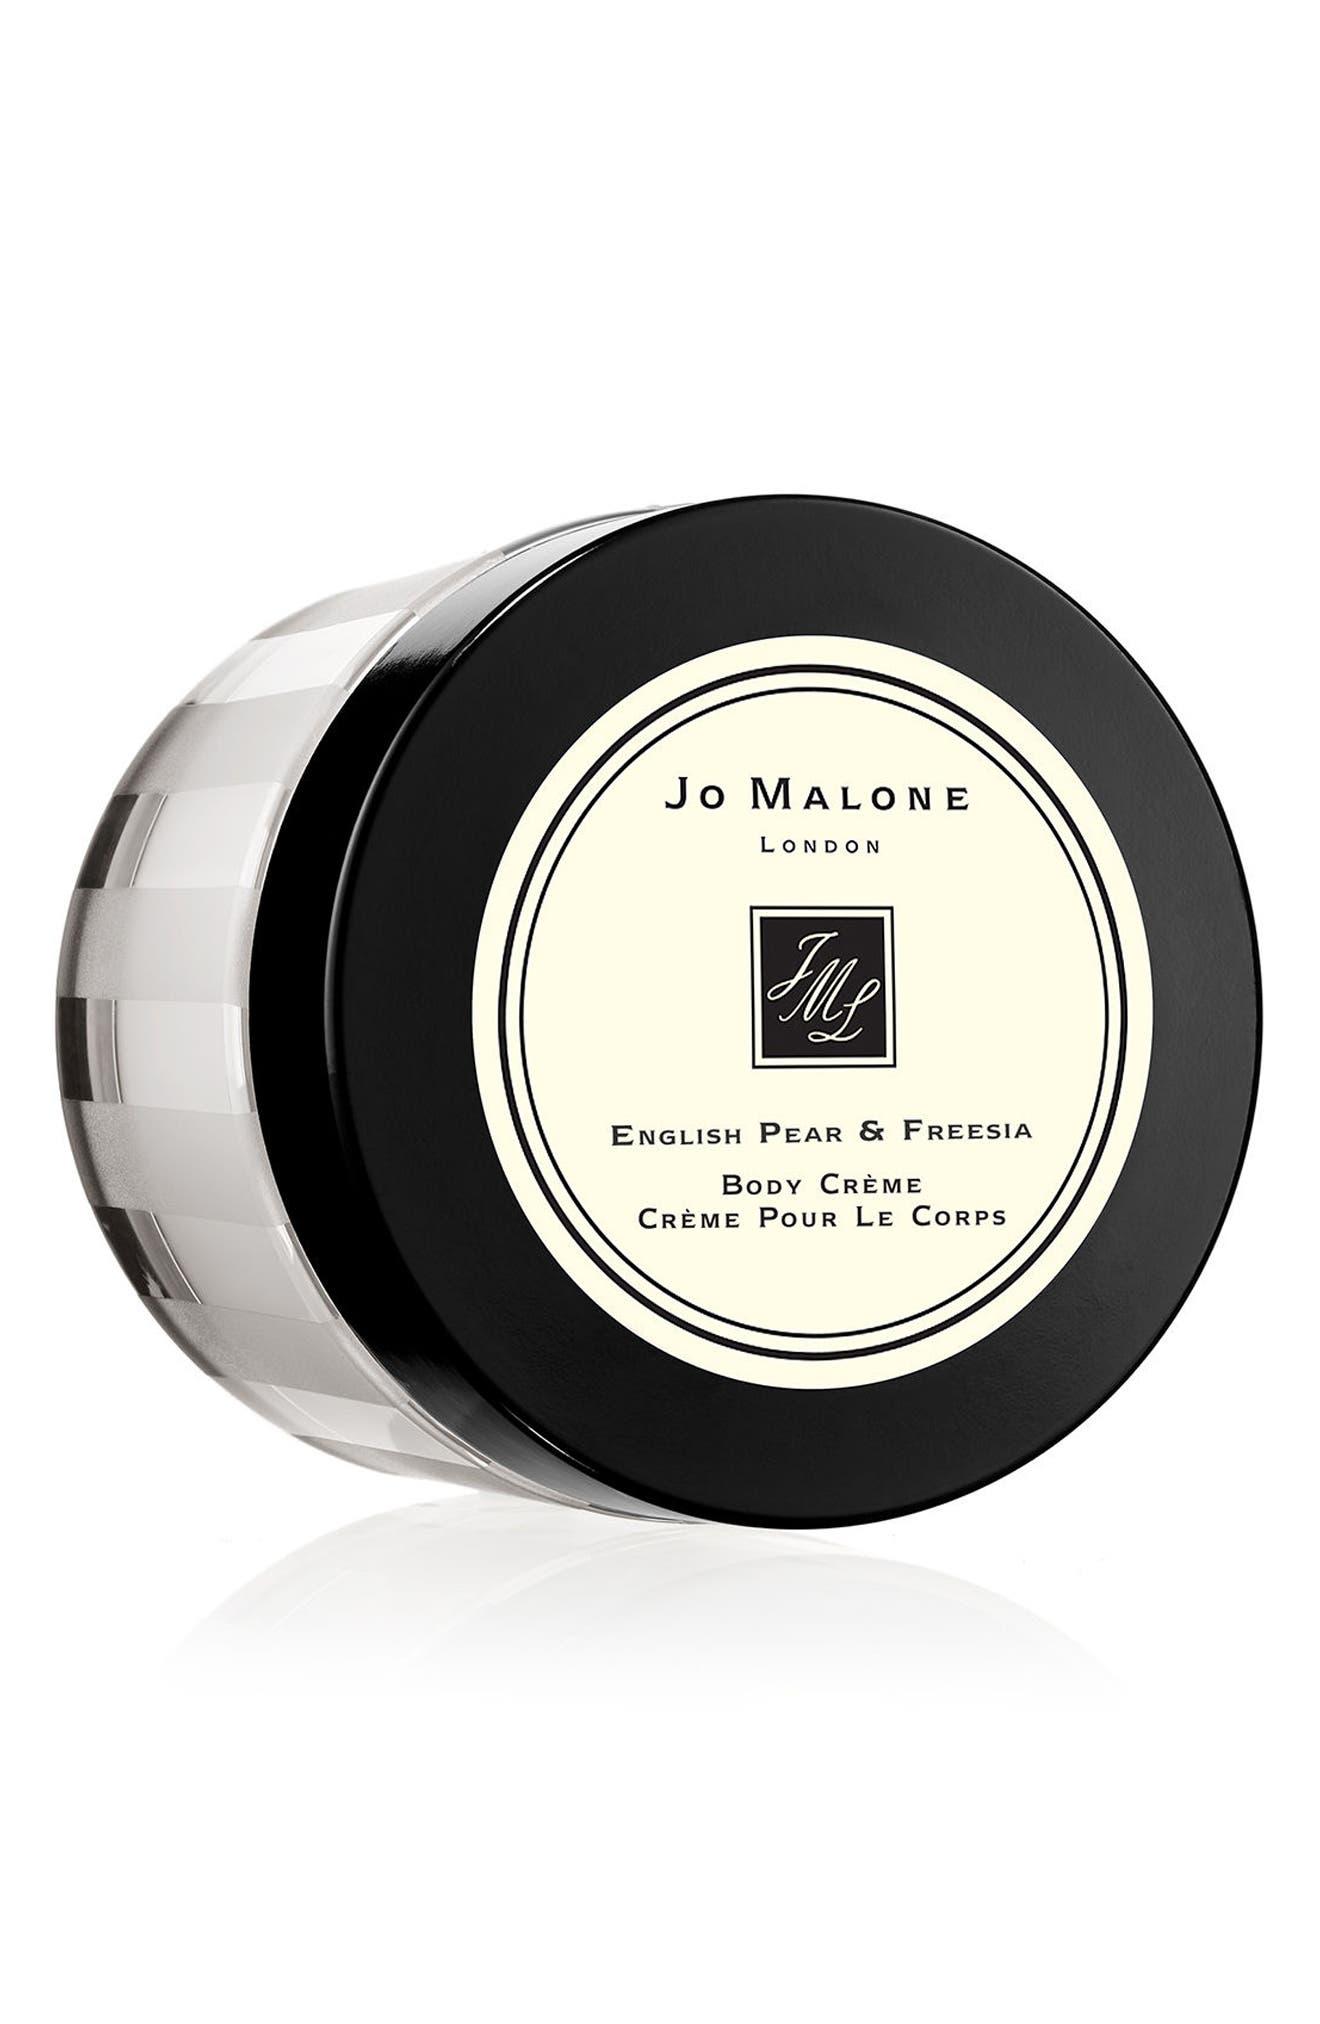 Jo Malone London(TM) Travel English Pear & Freesia Body Creme